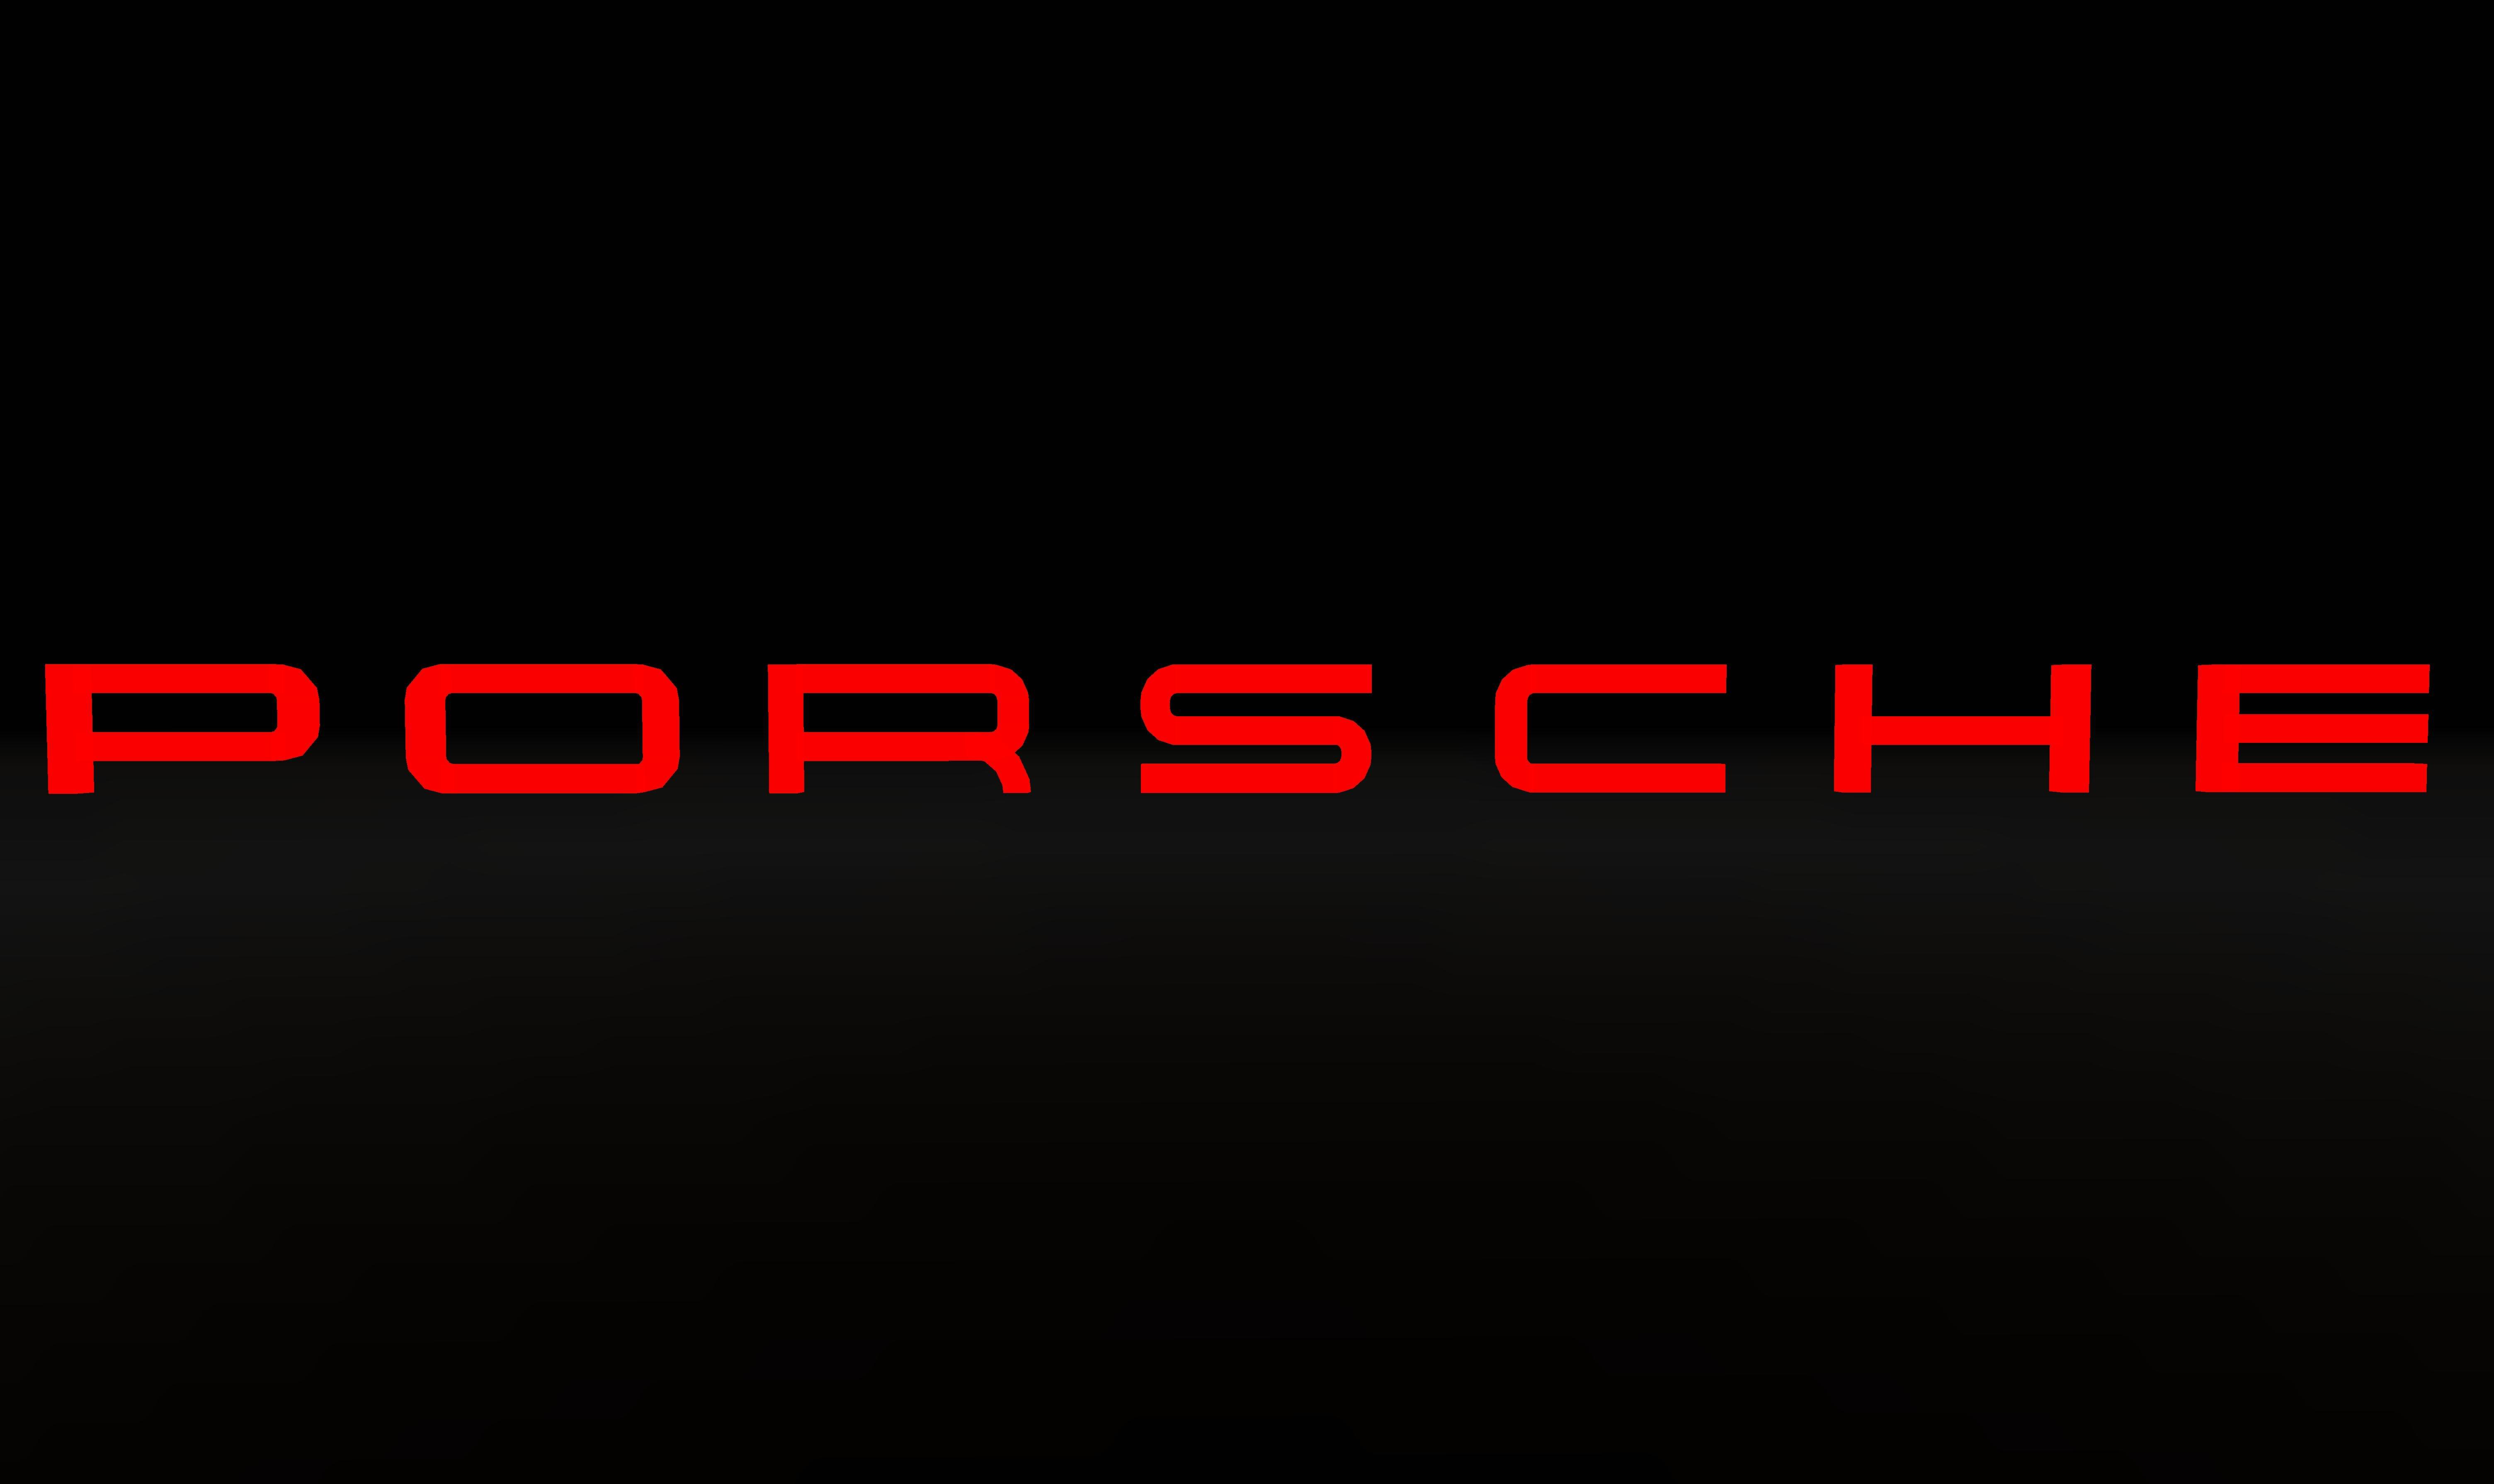 Porsche Logo Wallpapers Wallpaper Cave